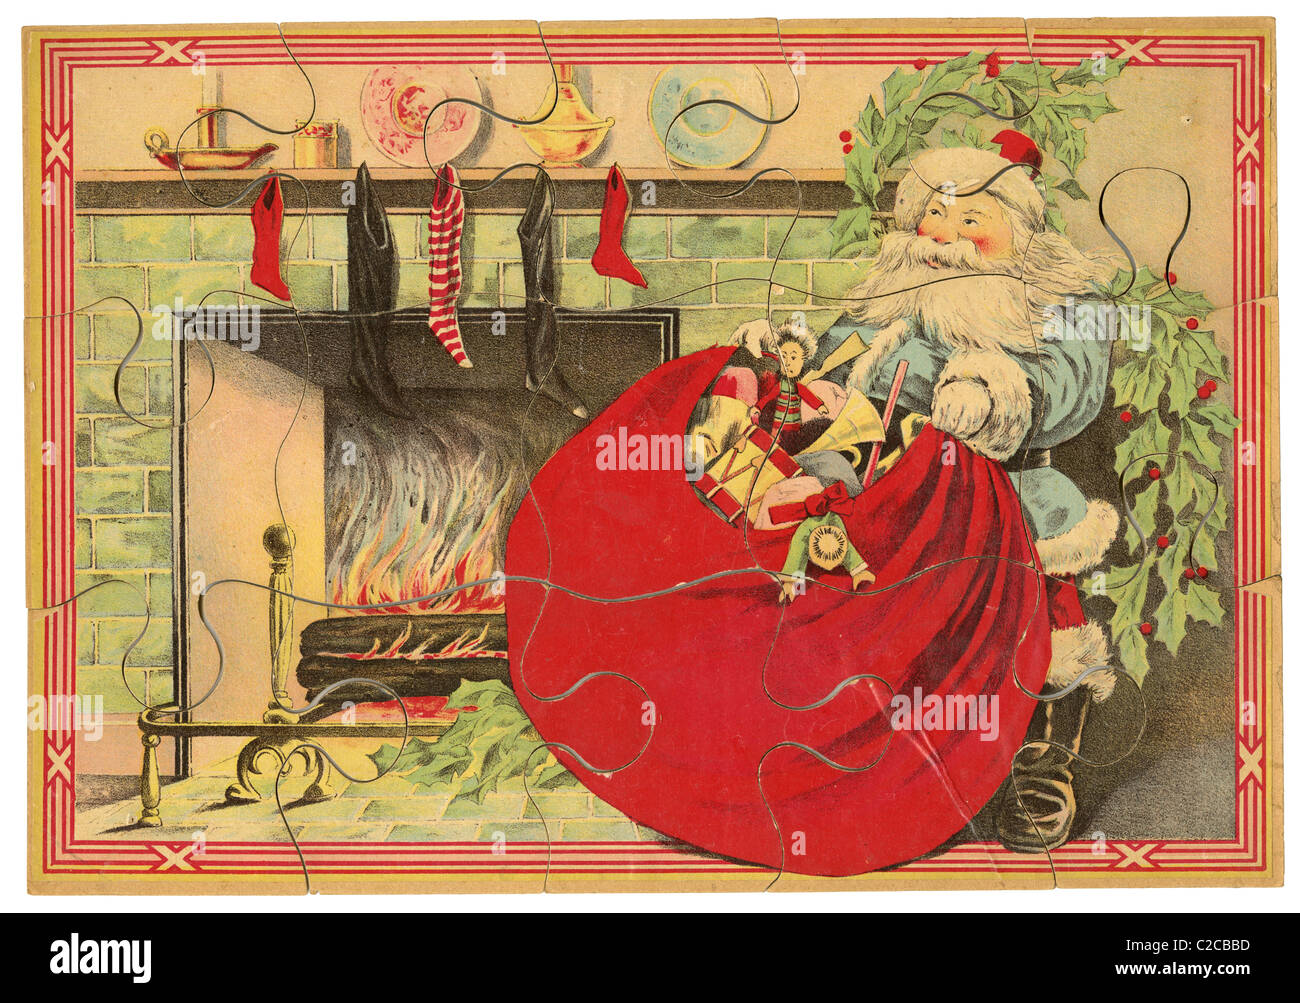 Circa 1890 Santa Claus puzzle por Milton Bradley. Imagen De Stock